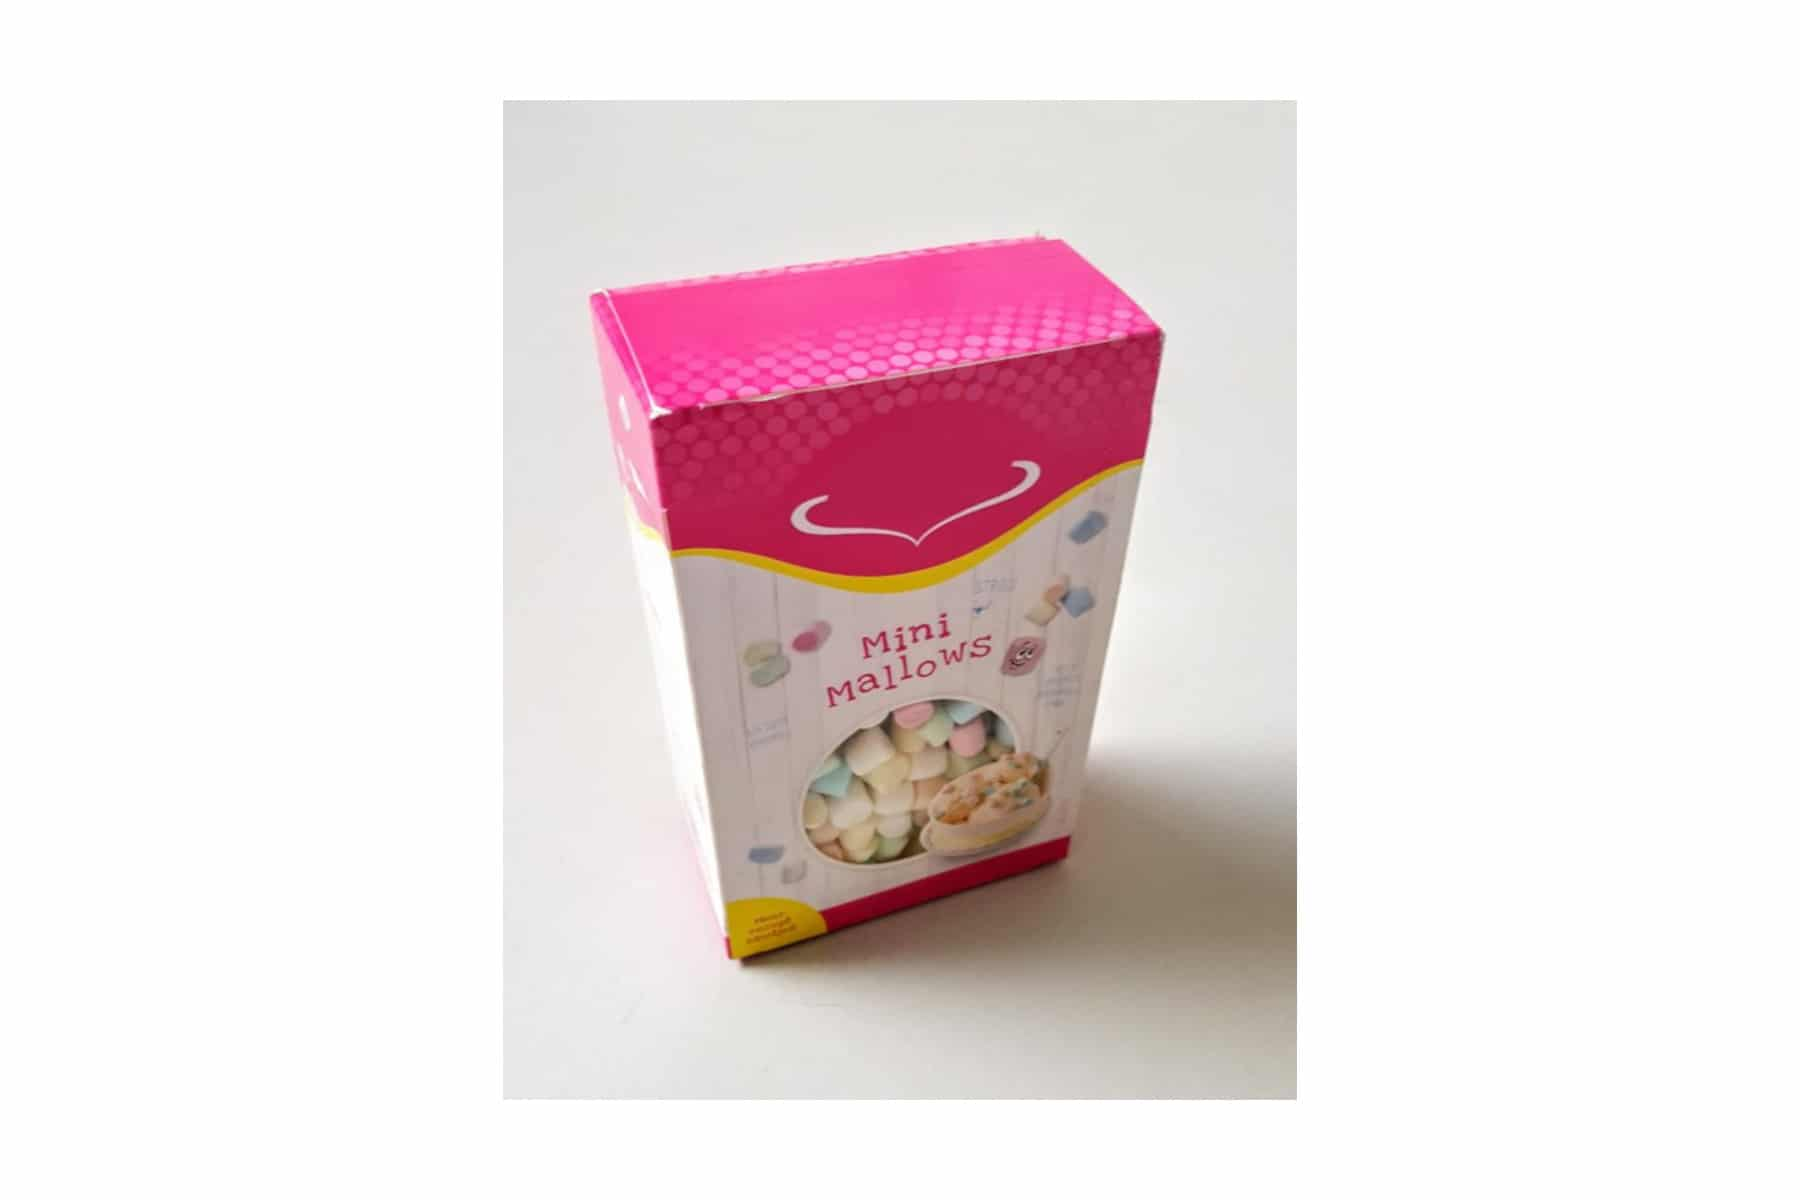 vouwkarton-verpakking-mini-mallows-mmb